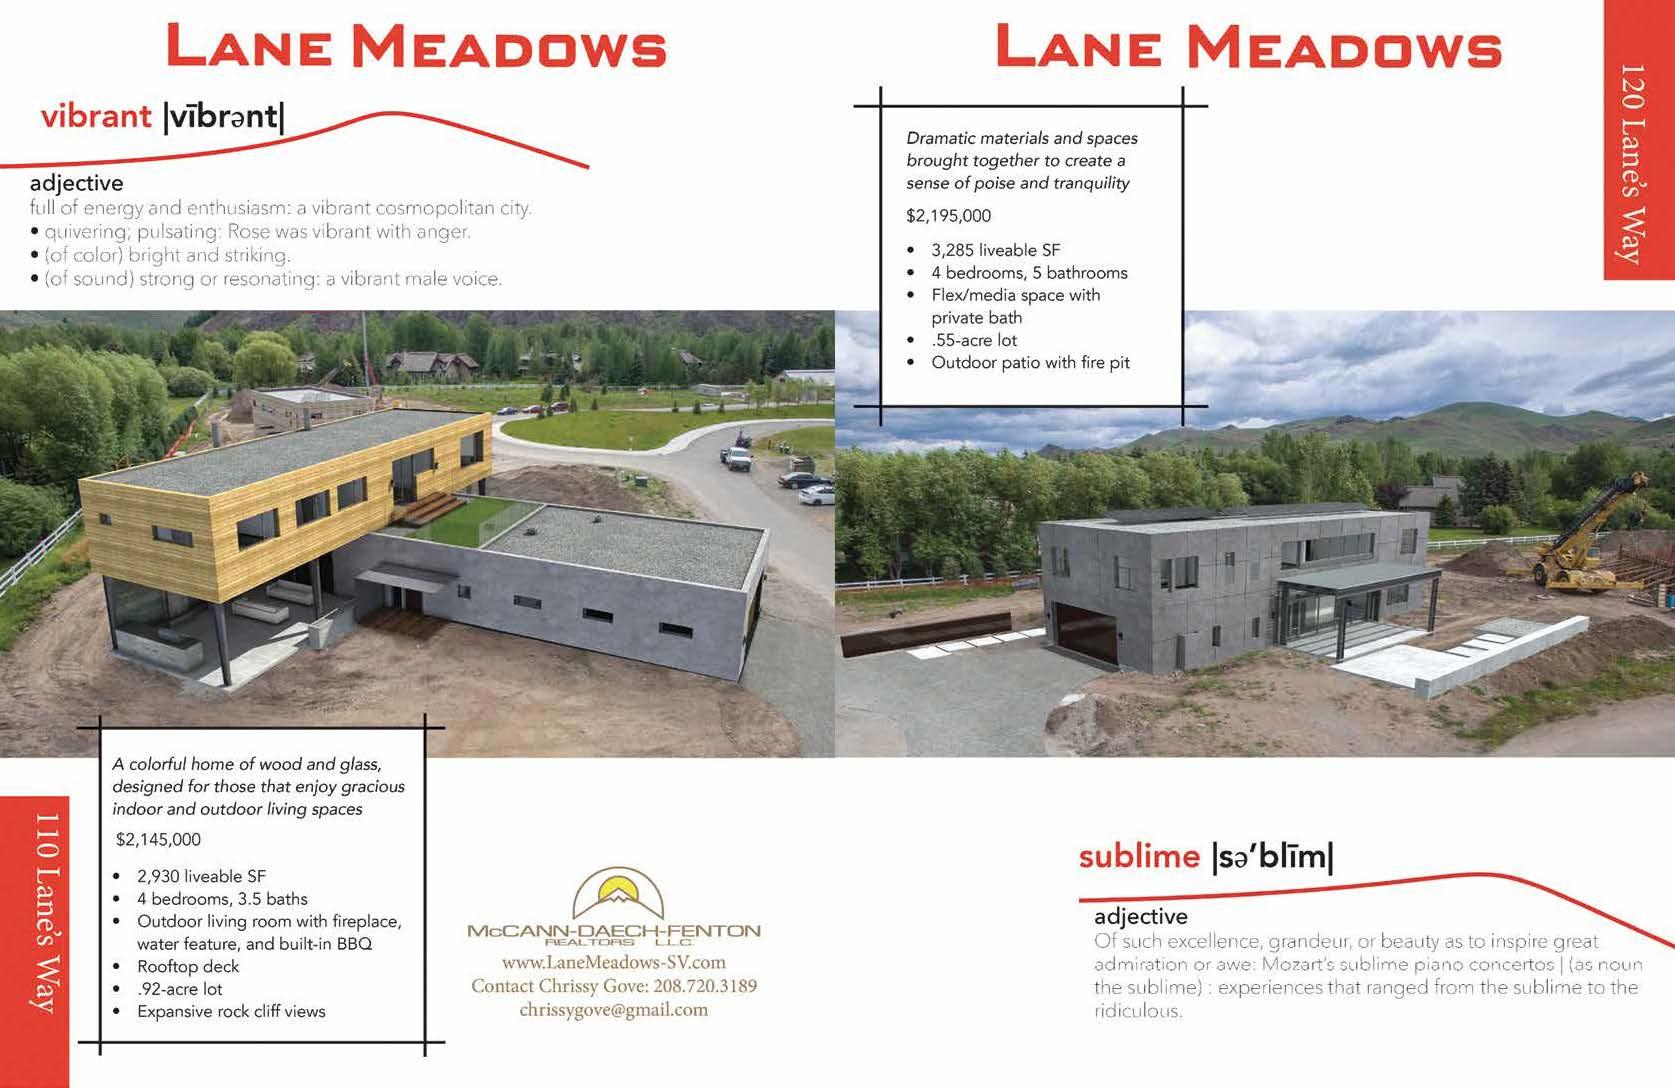 Lane Meadows Gallery (2)_Page_2.jpg